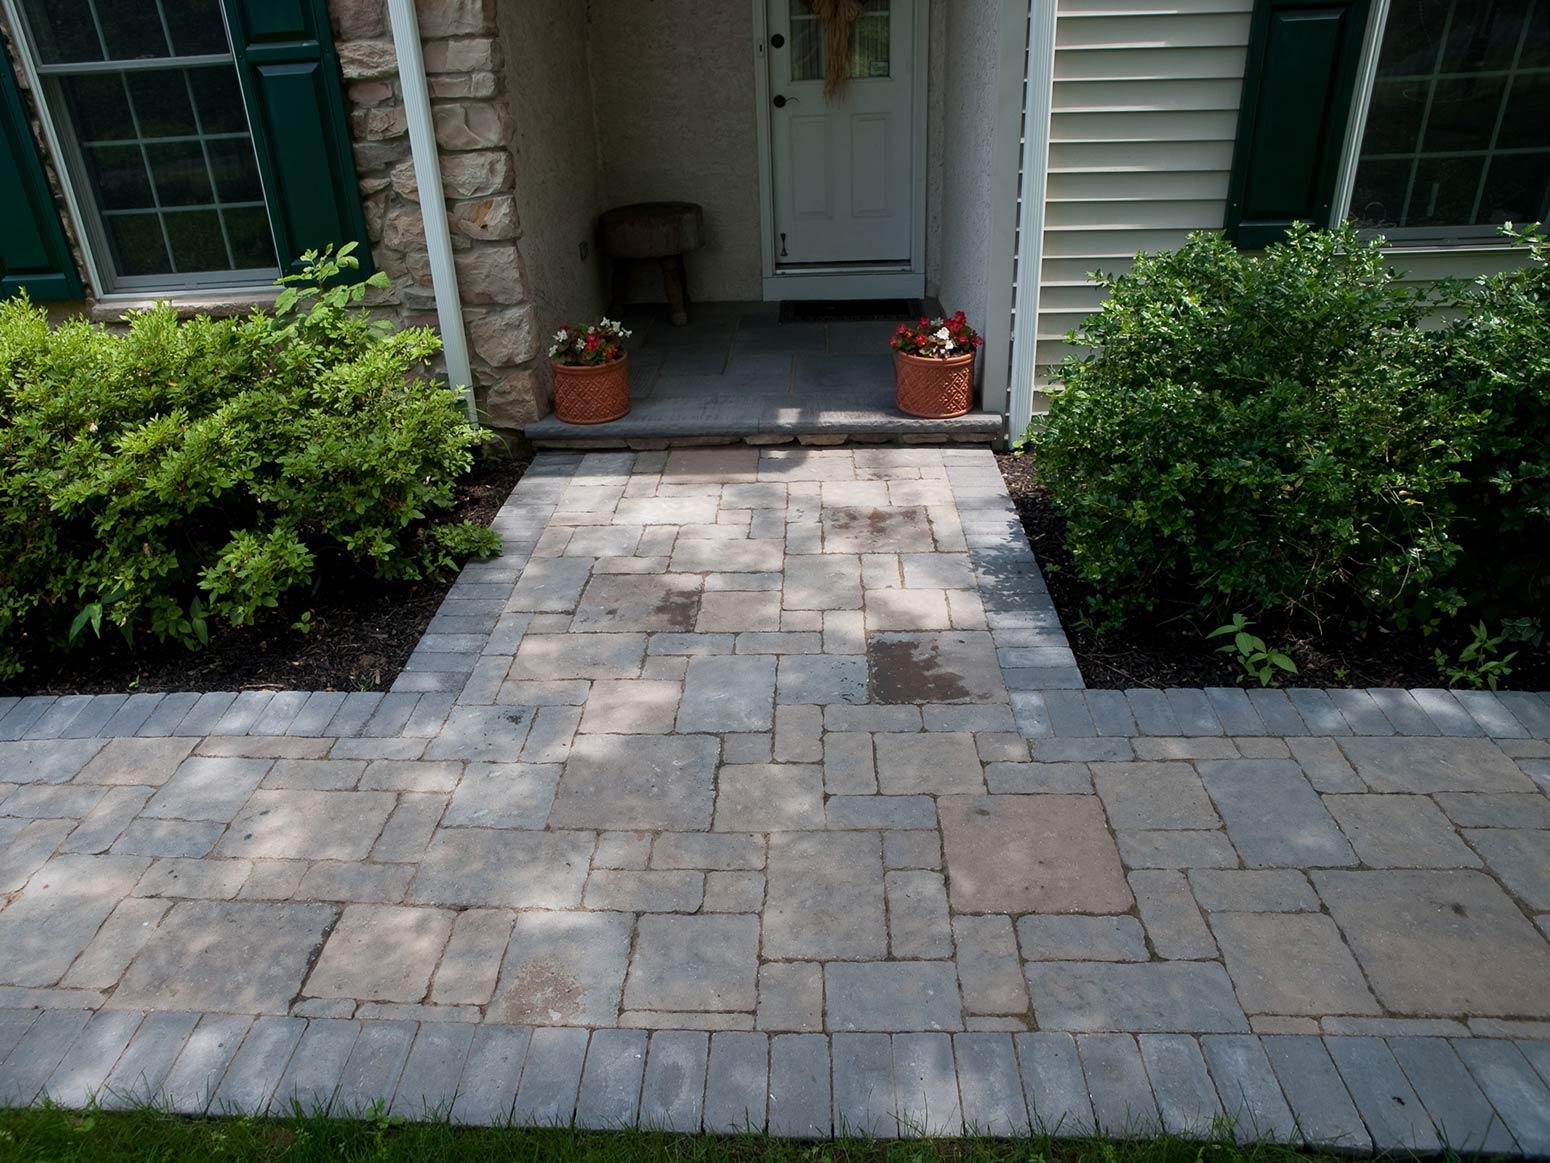 Natural Stone, EP Henry Paver Walkways, Brick Patio ... on Patio Paver Walkway Ideas id=75715